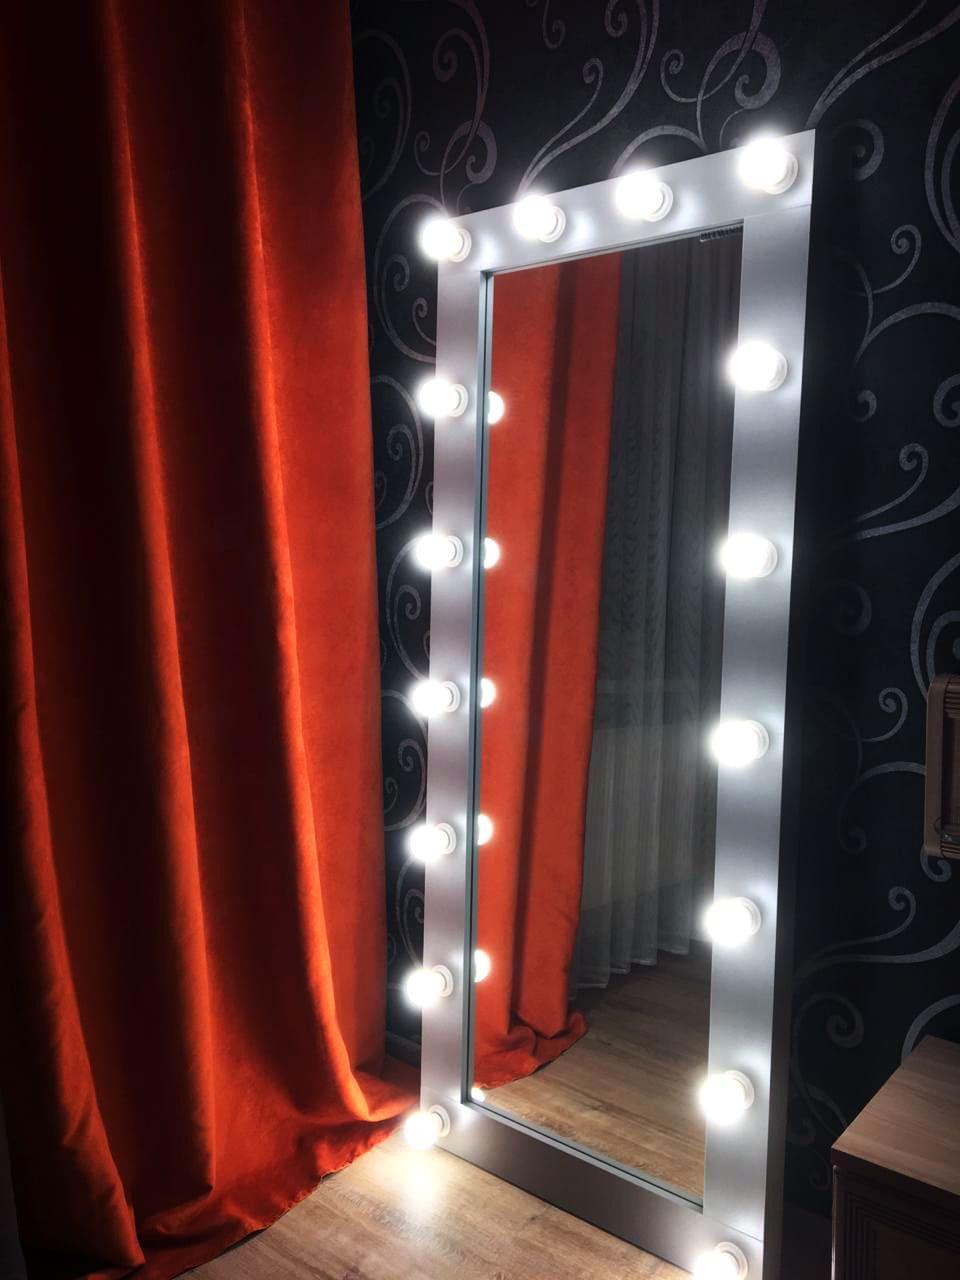 Гримерное зеркало 1800*800 мм, зеркало визажиста, зеркало с лампочками ЛДСП Серебро